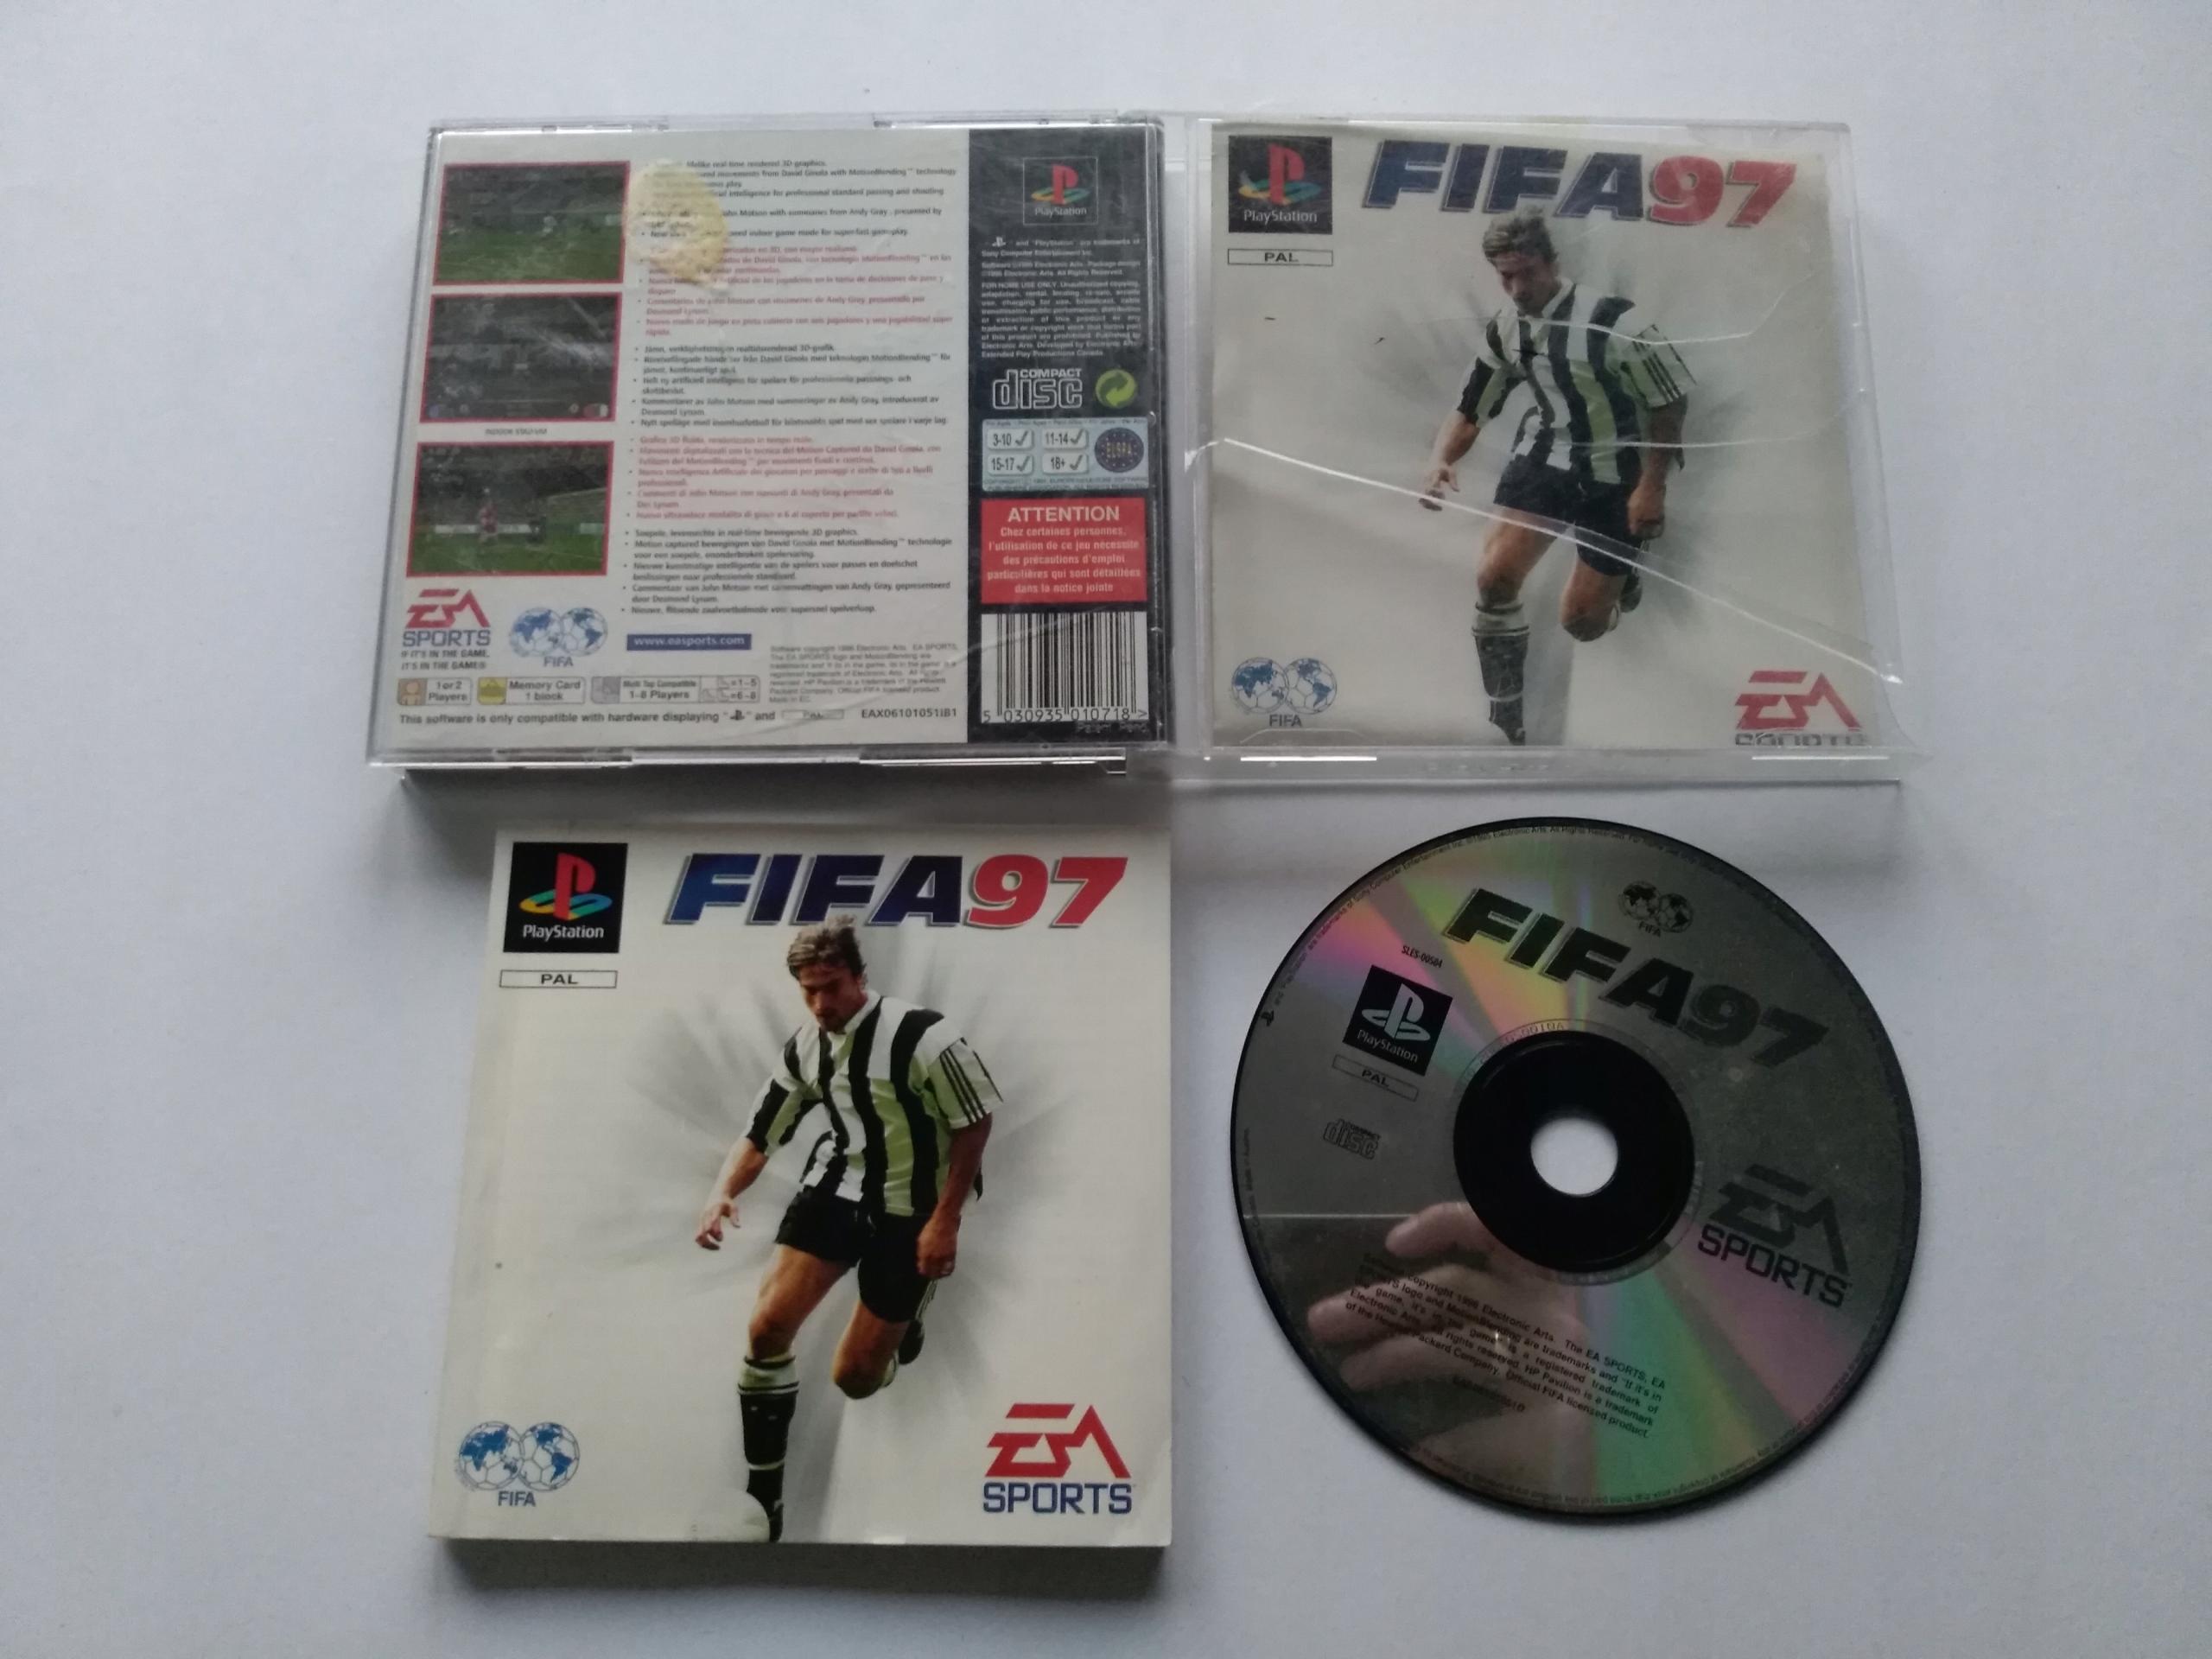 d46e73f29 FIFA 97 SKLEP GWARANCJA - 7679459138 - oficjalne archiwum allegro